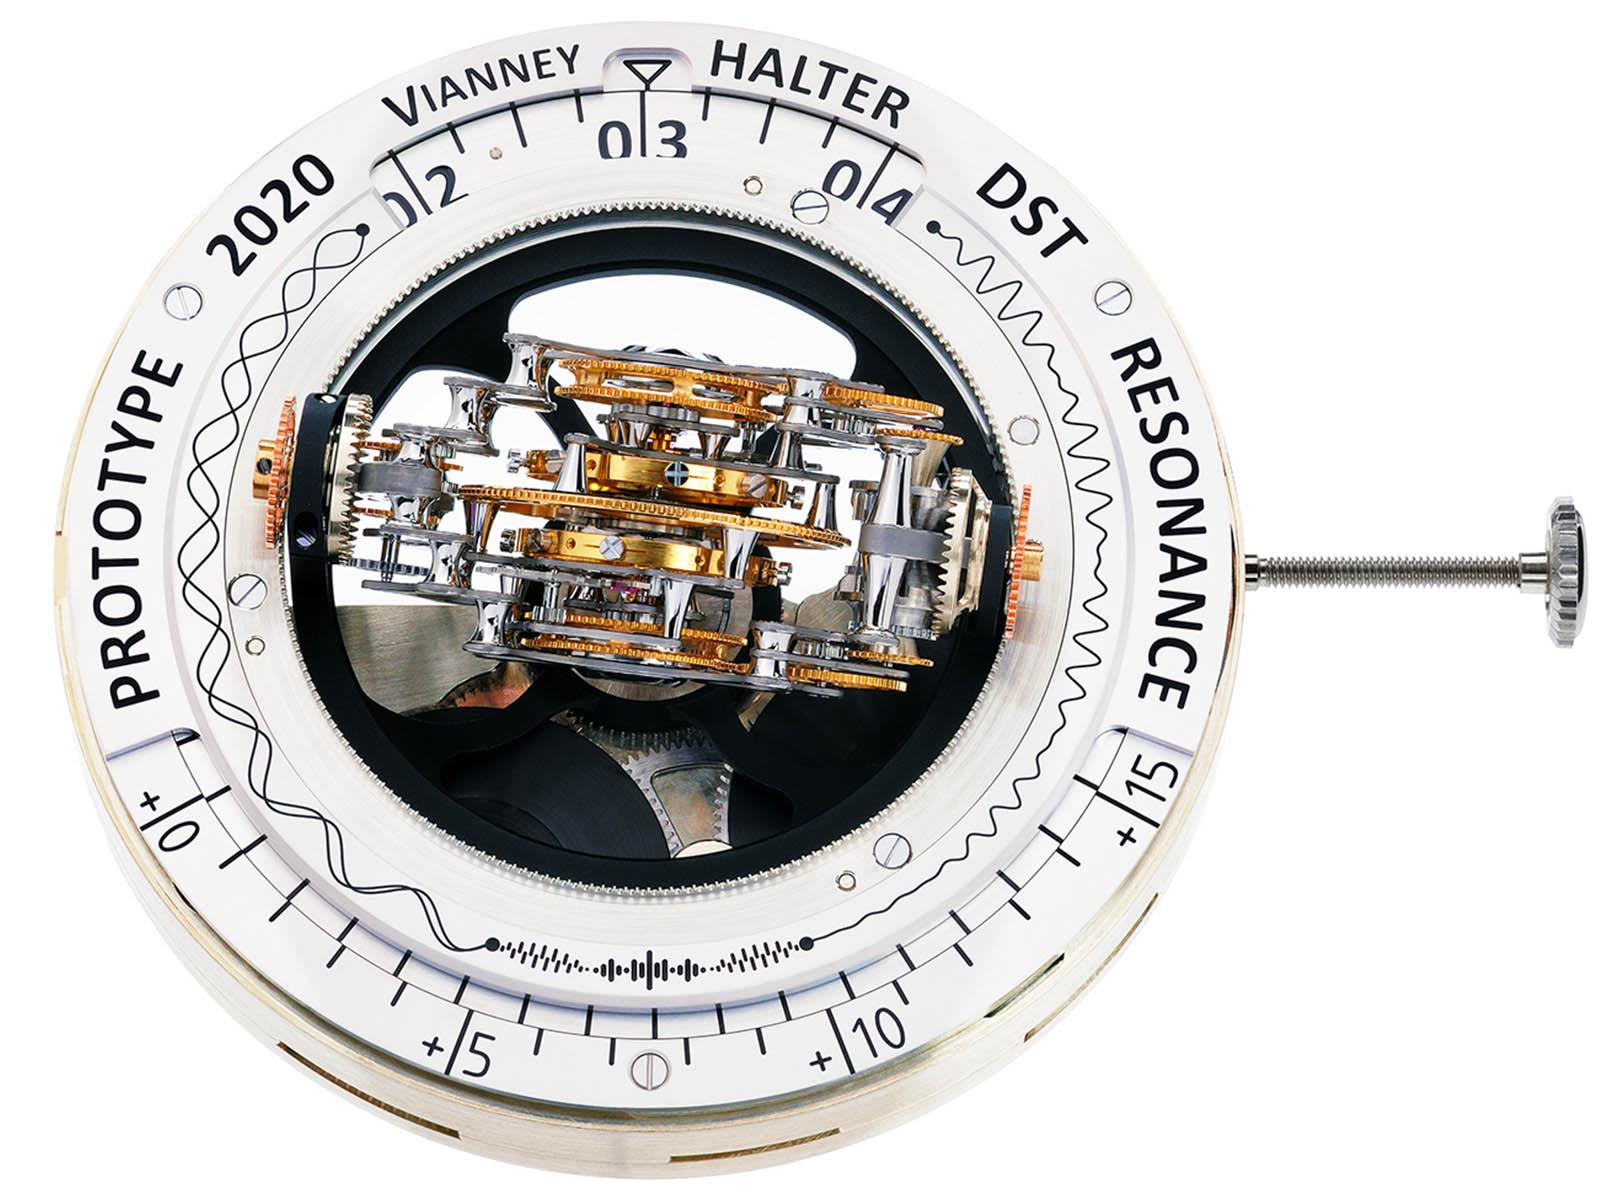 vianney-halter-deep-space-resonance-prototype-4.jpg